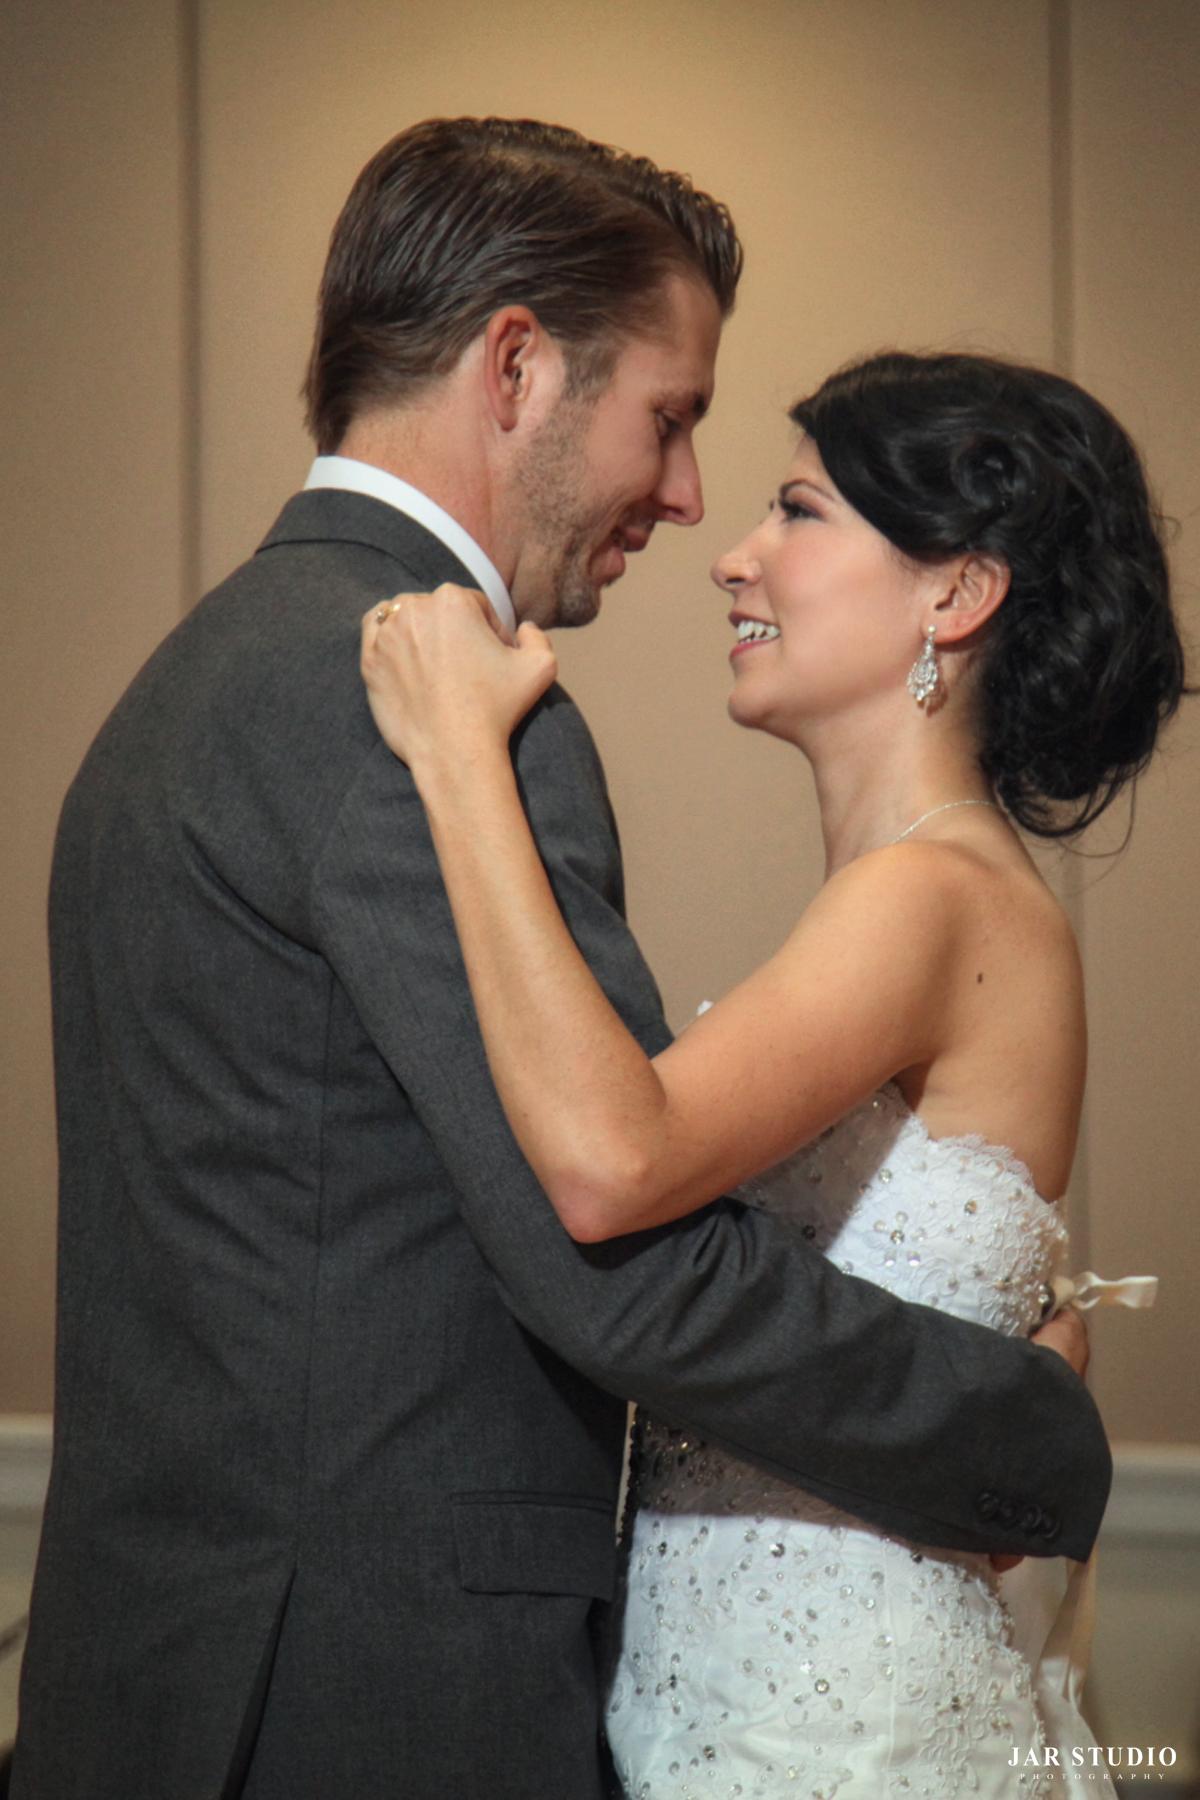 z-Lakeshore-Center-wedding-photographer-jarstudio (2).JPG